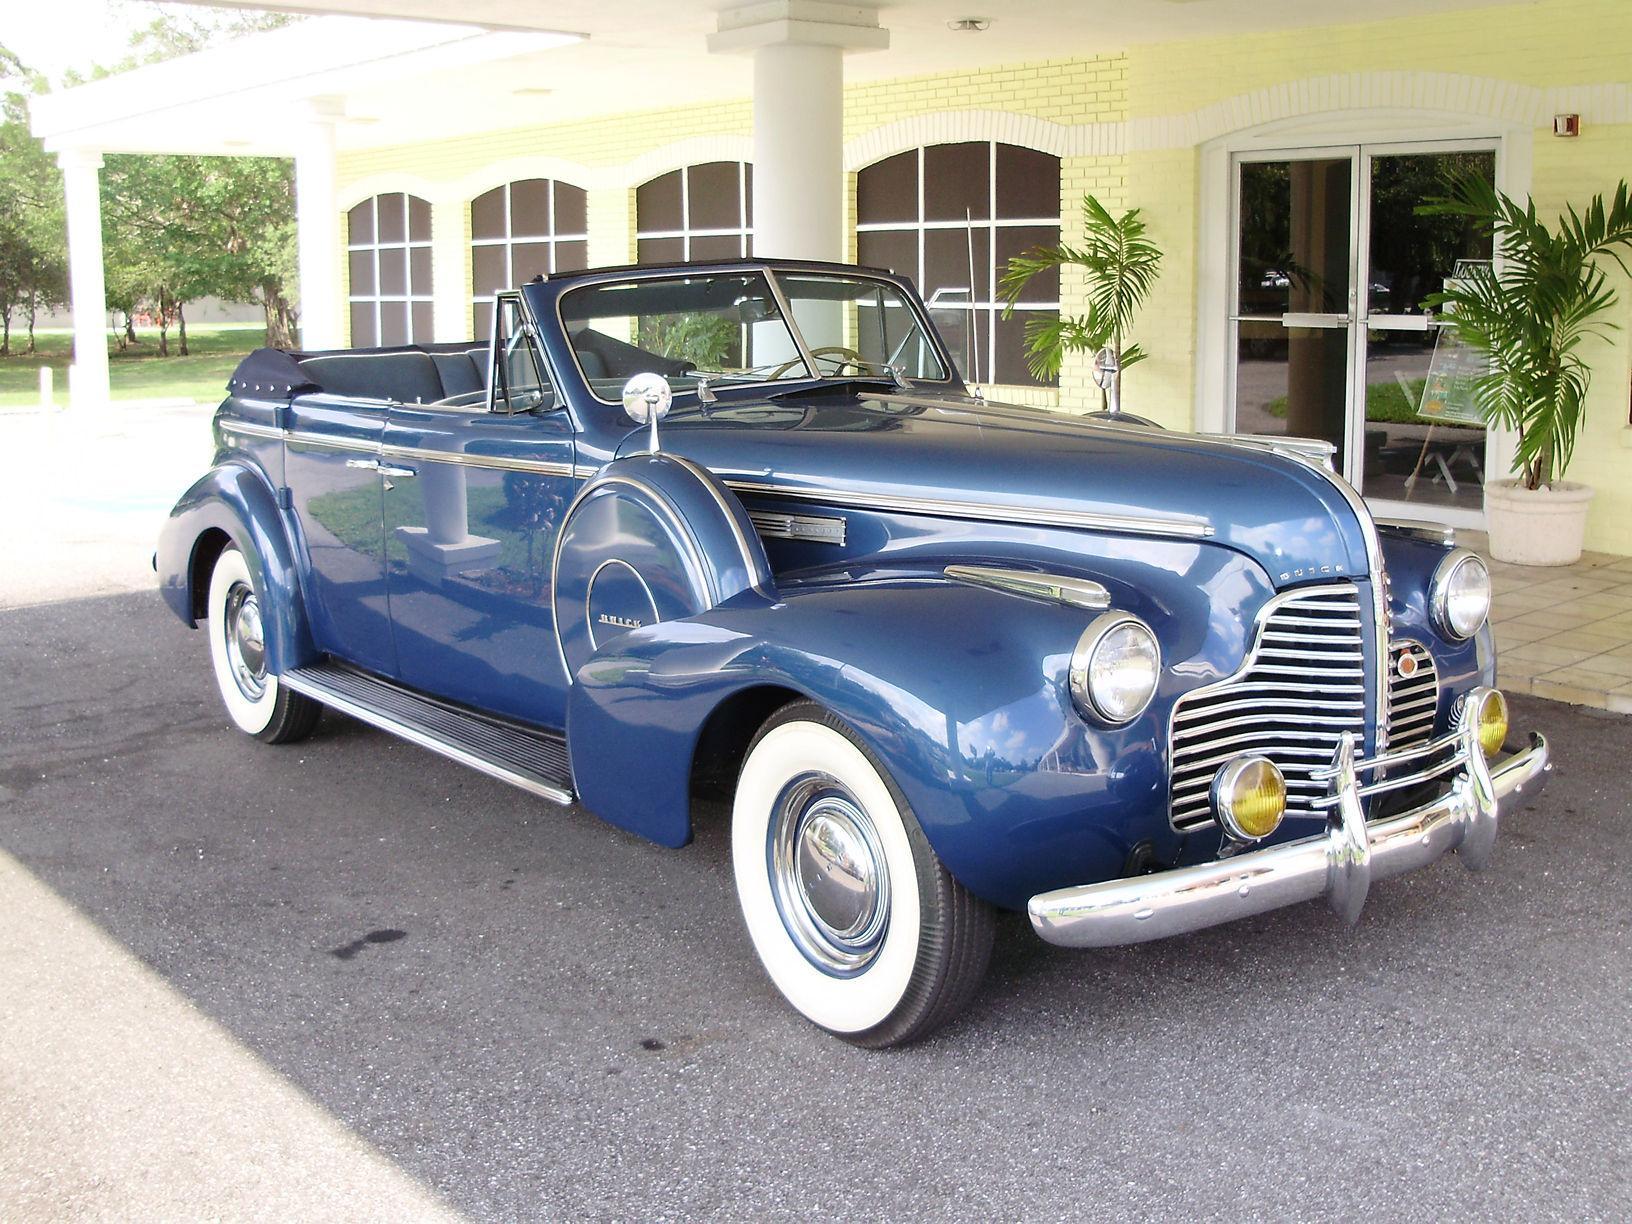 1940 BUICK CENTURY CONVERTIBLE SEDAN - Vintage Motors of Sarasota Inc. #44